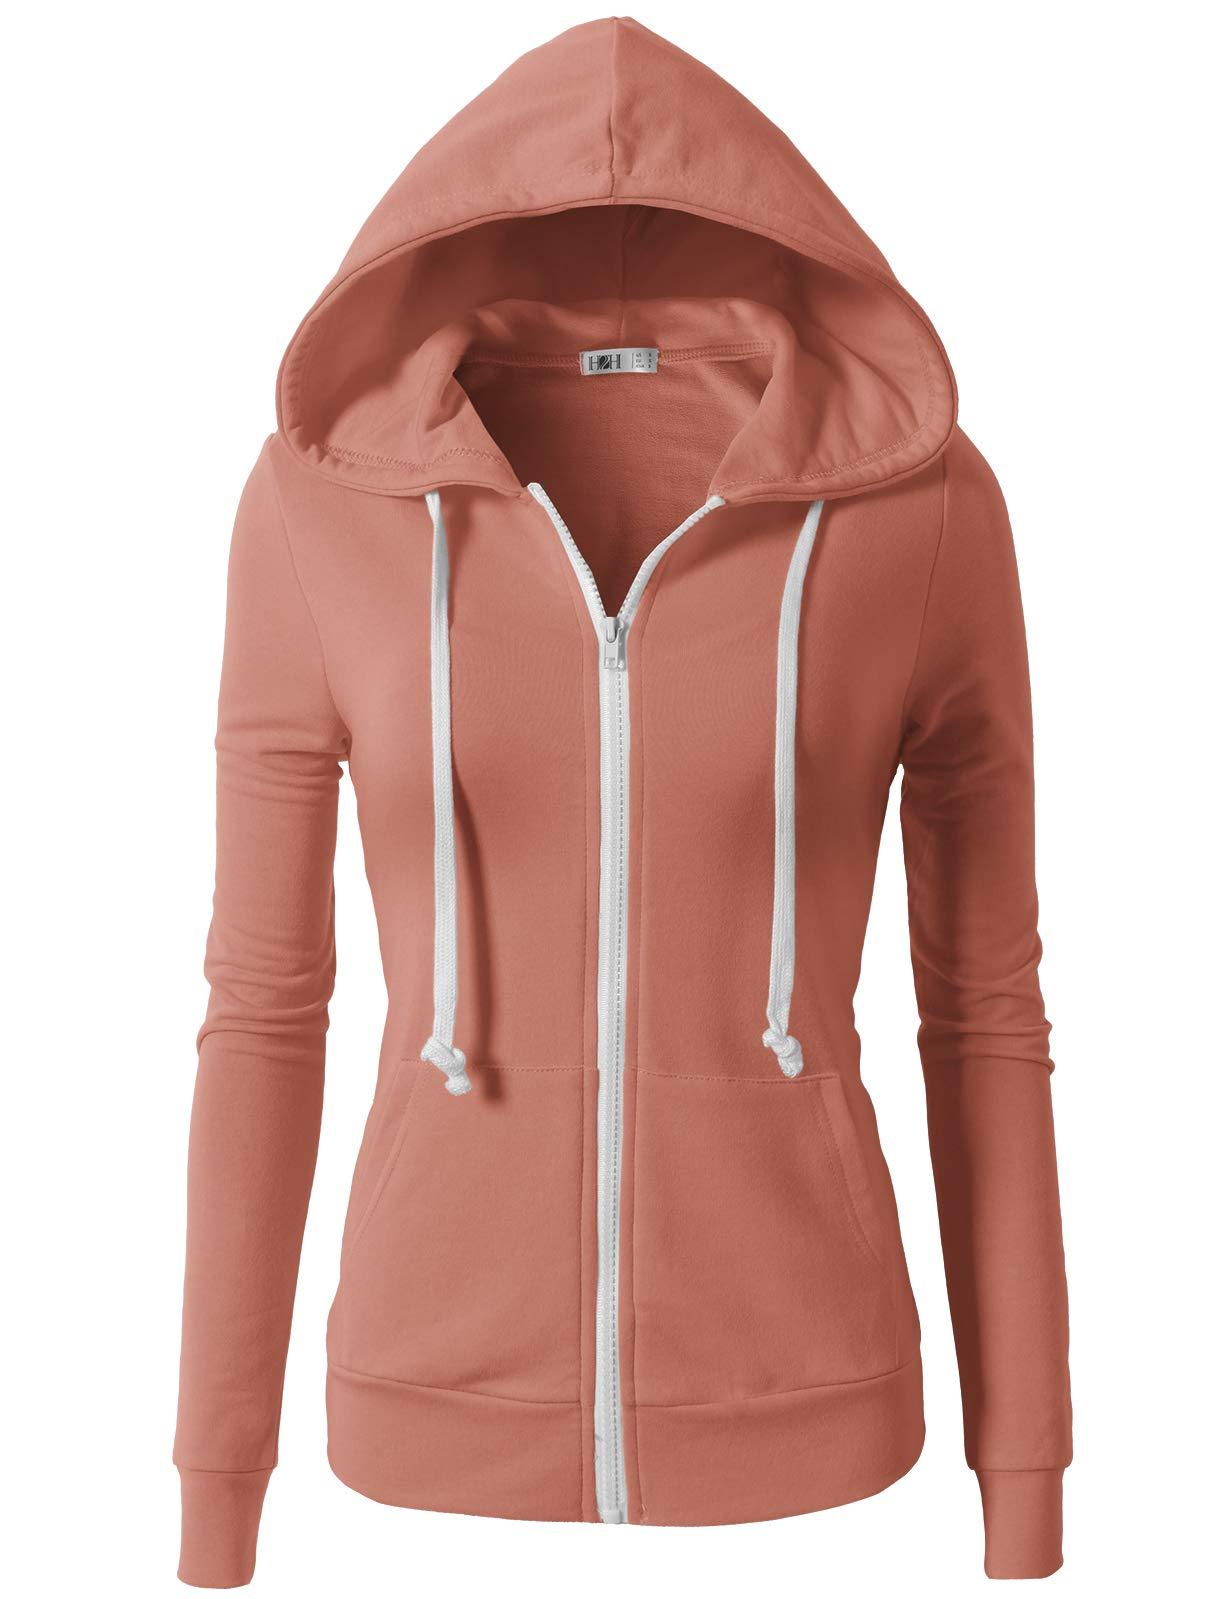 H2H Womens Active Regular Fit Zip up Long Sleeve Hoodie Jacket MAUVEPINK XS (CWOHOL020)